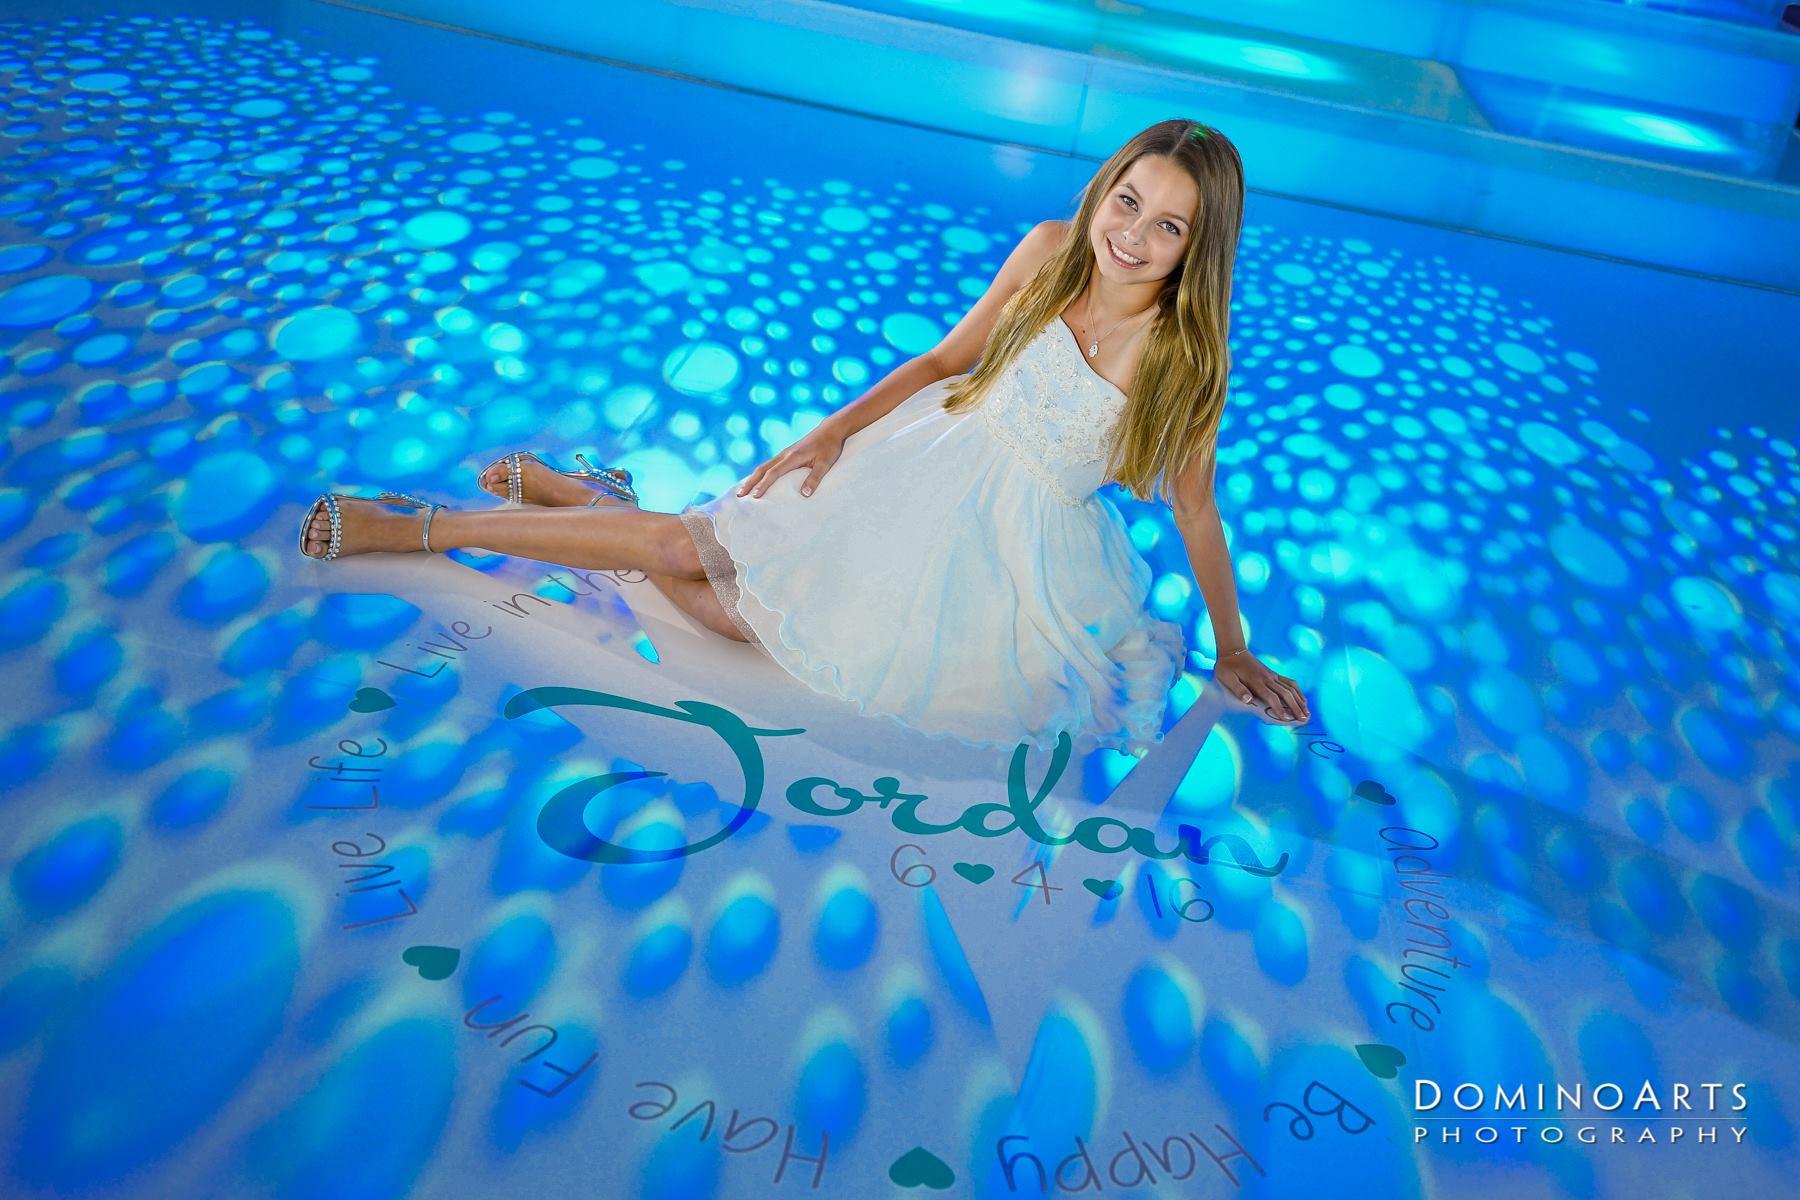 Photo By: Domino Arts Photography